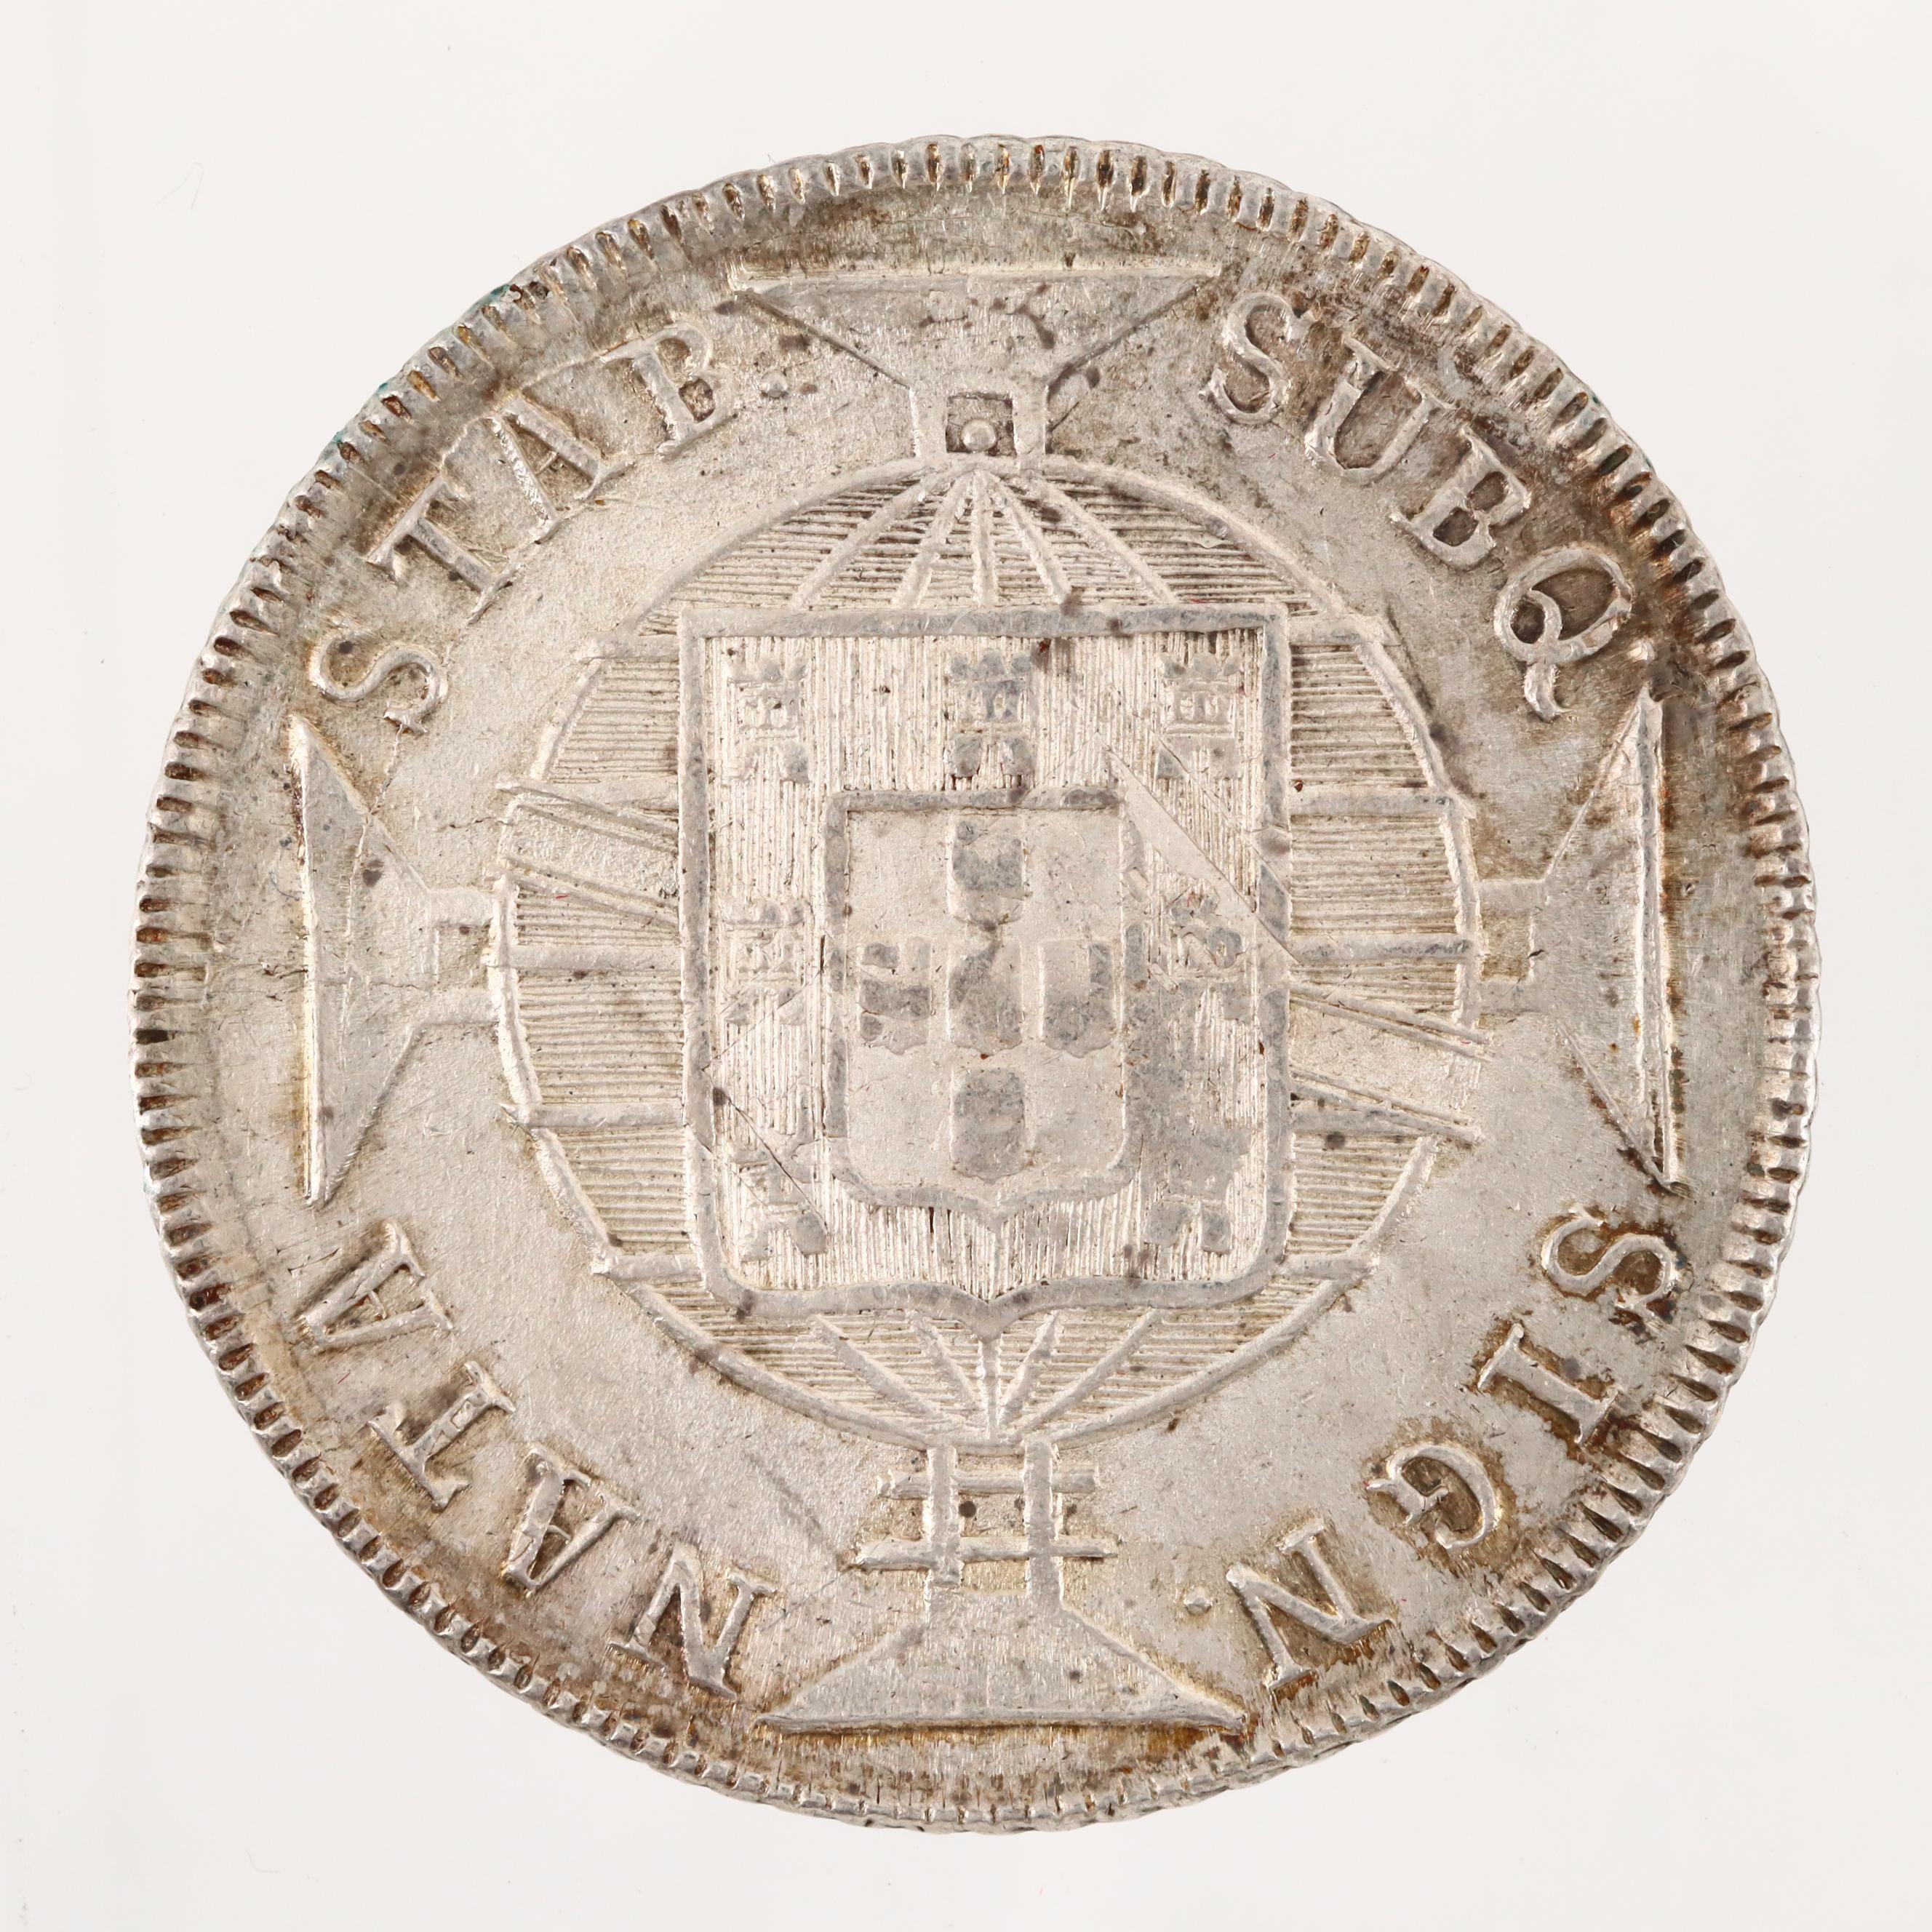 Brazil 1818-R 960 Reis Struck Under João VI Silver Coin